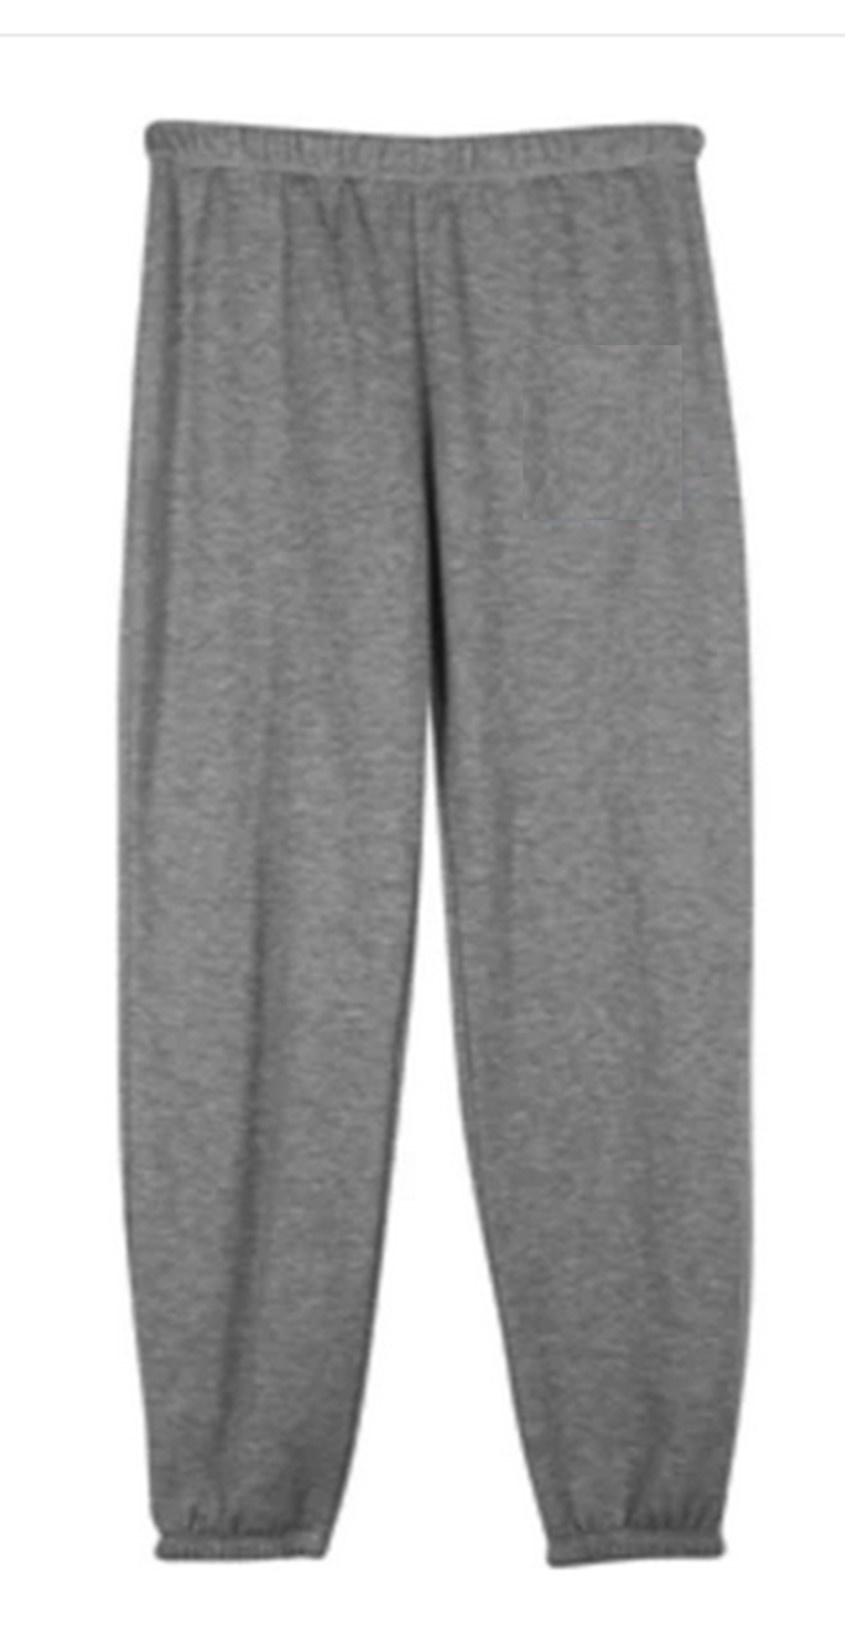 Firehouse Heather Grey Sweatpant